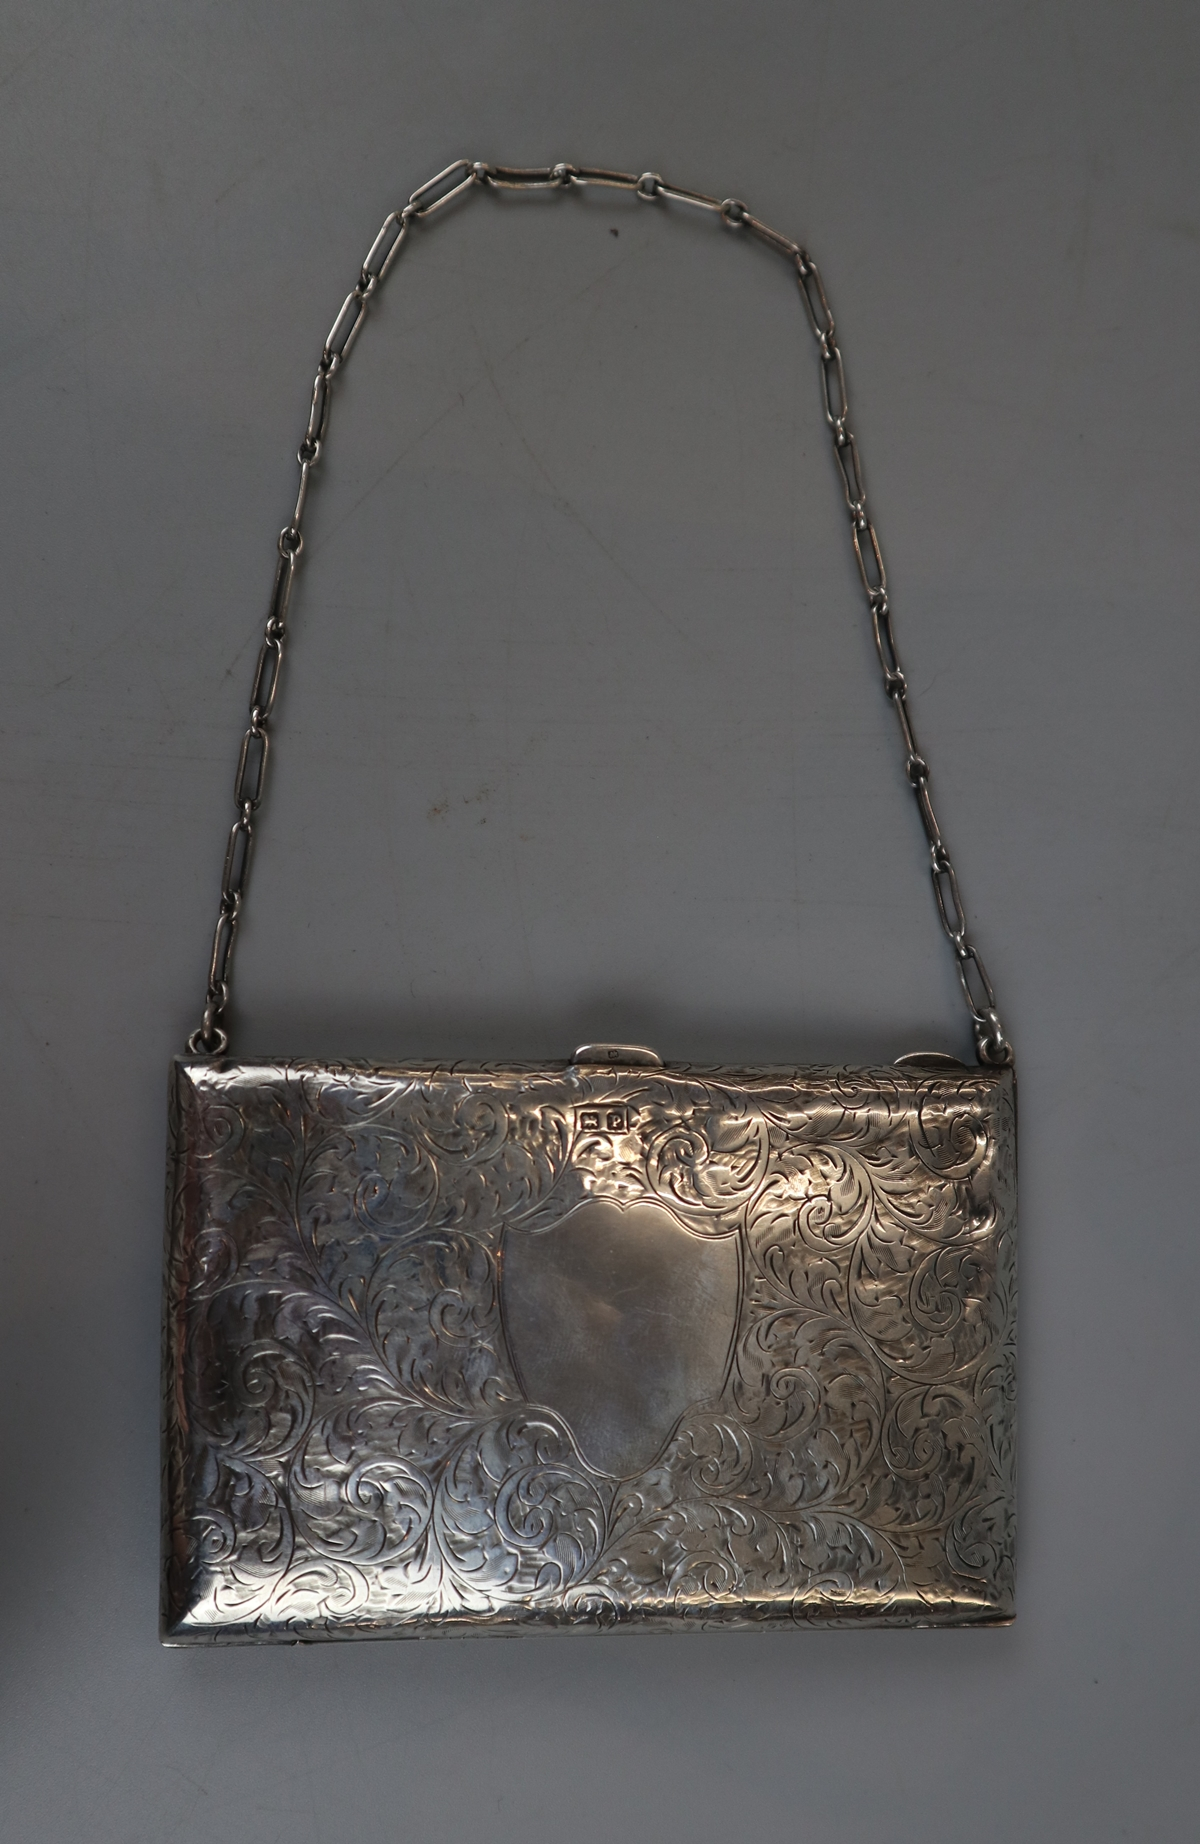 Unusual hallmarked silver note case/purse - W H Hassler circa 1914